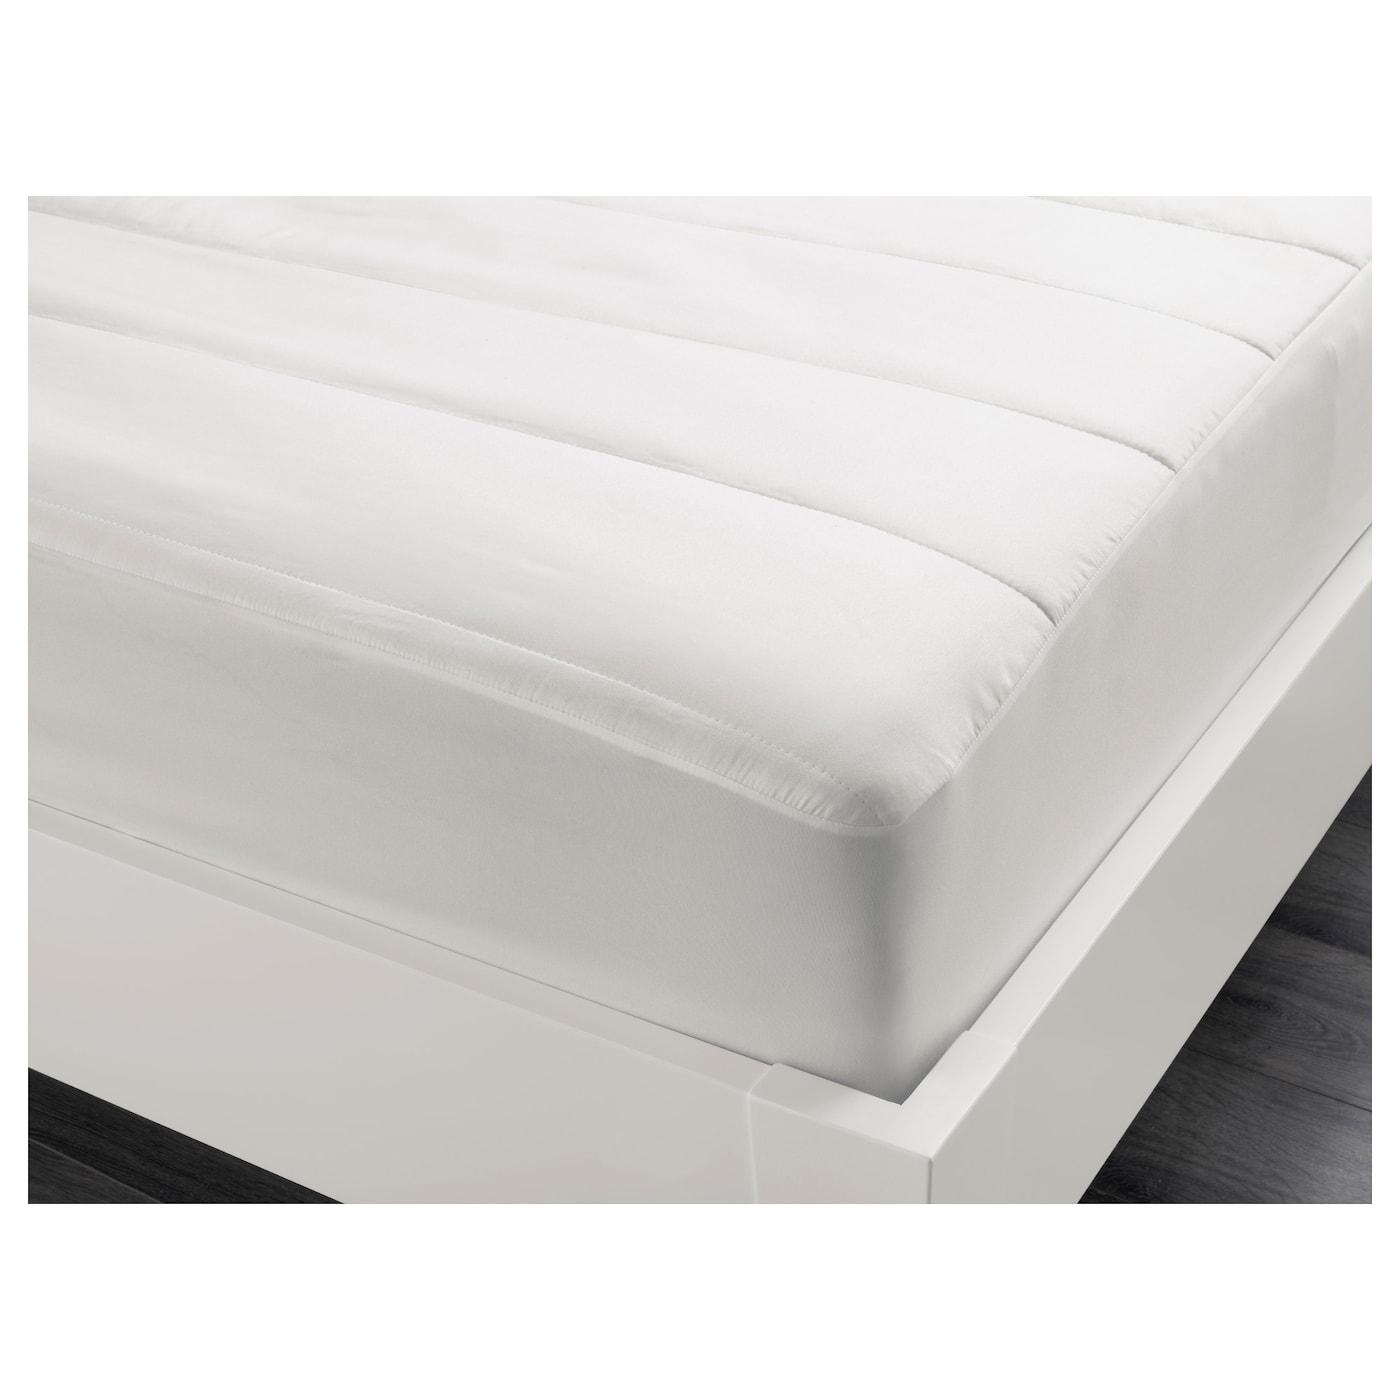 p rlmalva al se 160x200 cm ikea. Black Bedroom Furniture Sets. Home Design Ideas